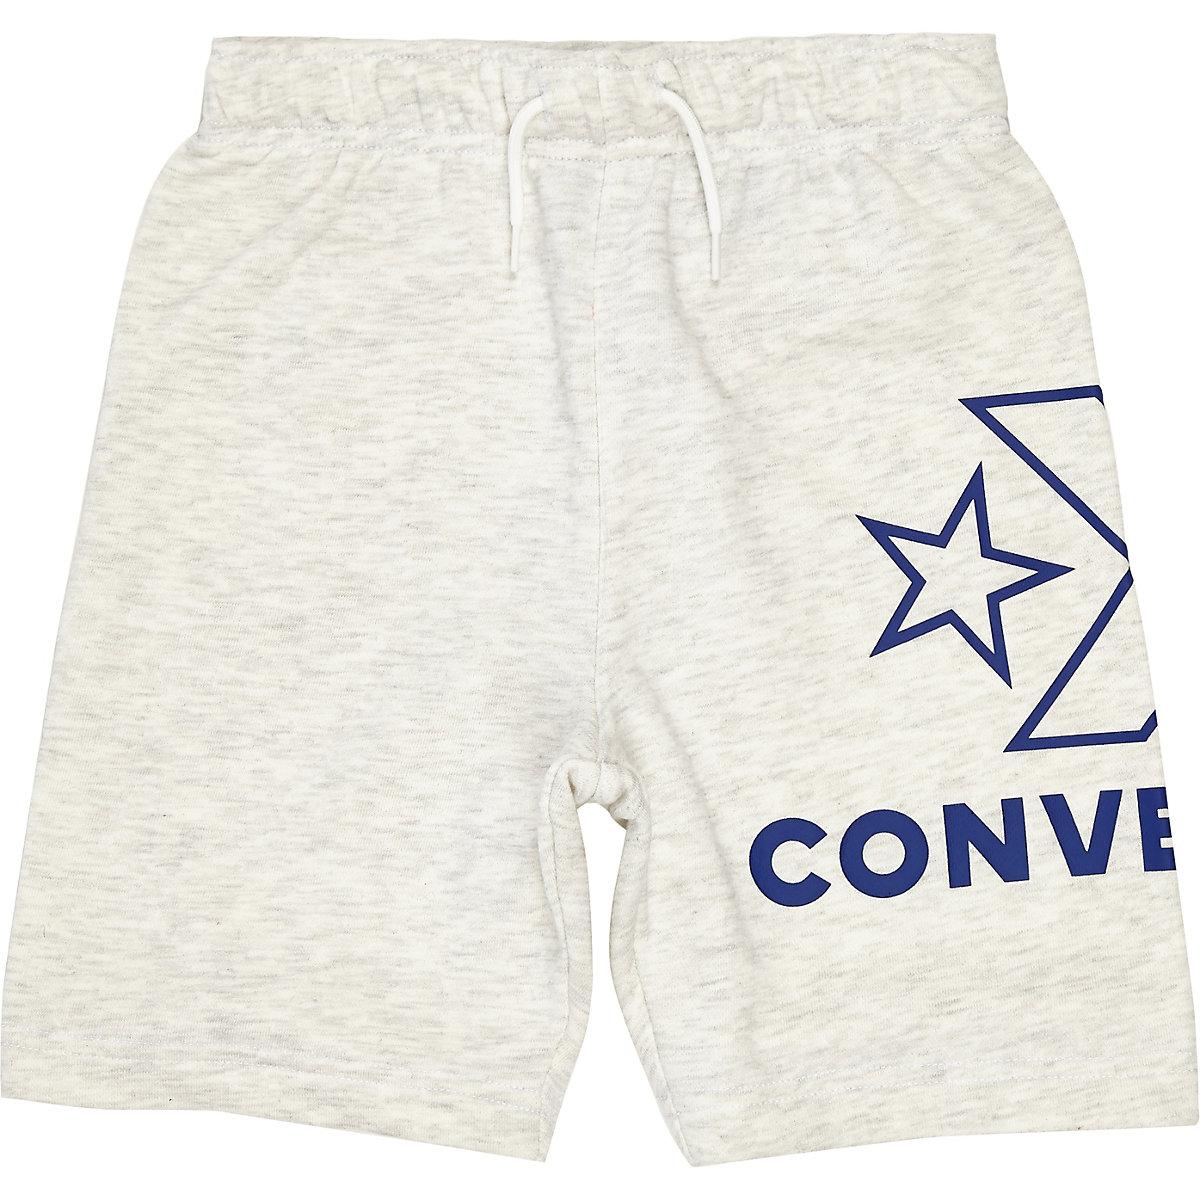 Boys white Converse logo jersey shorts